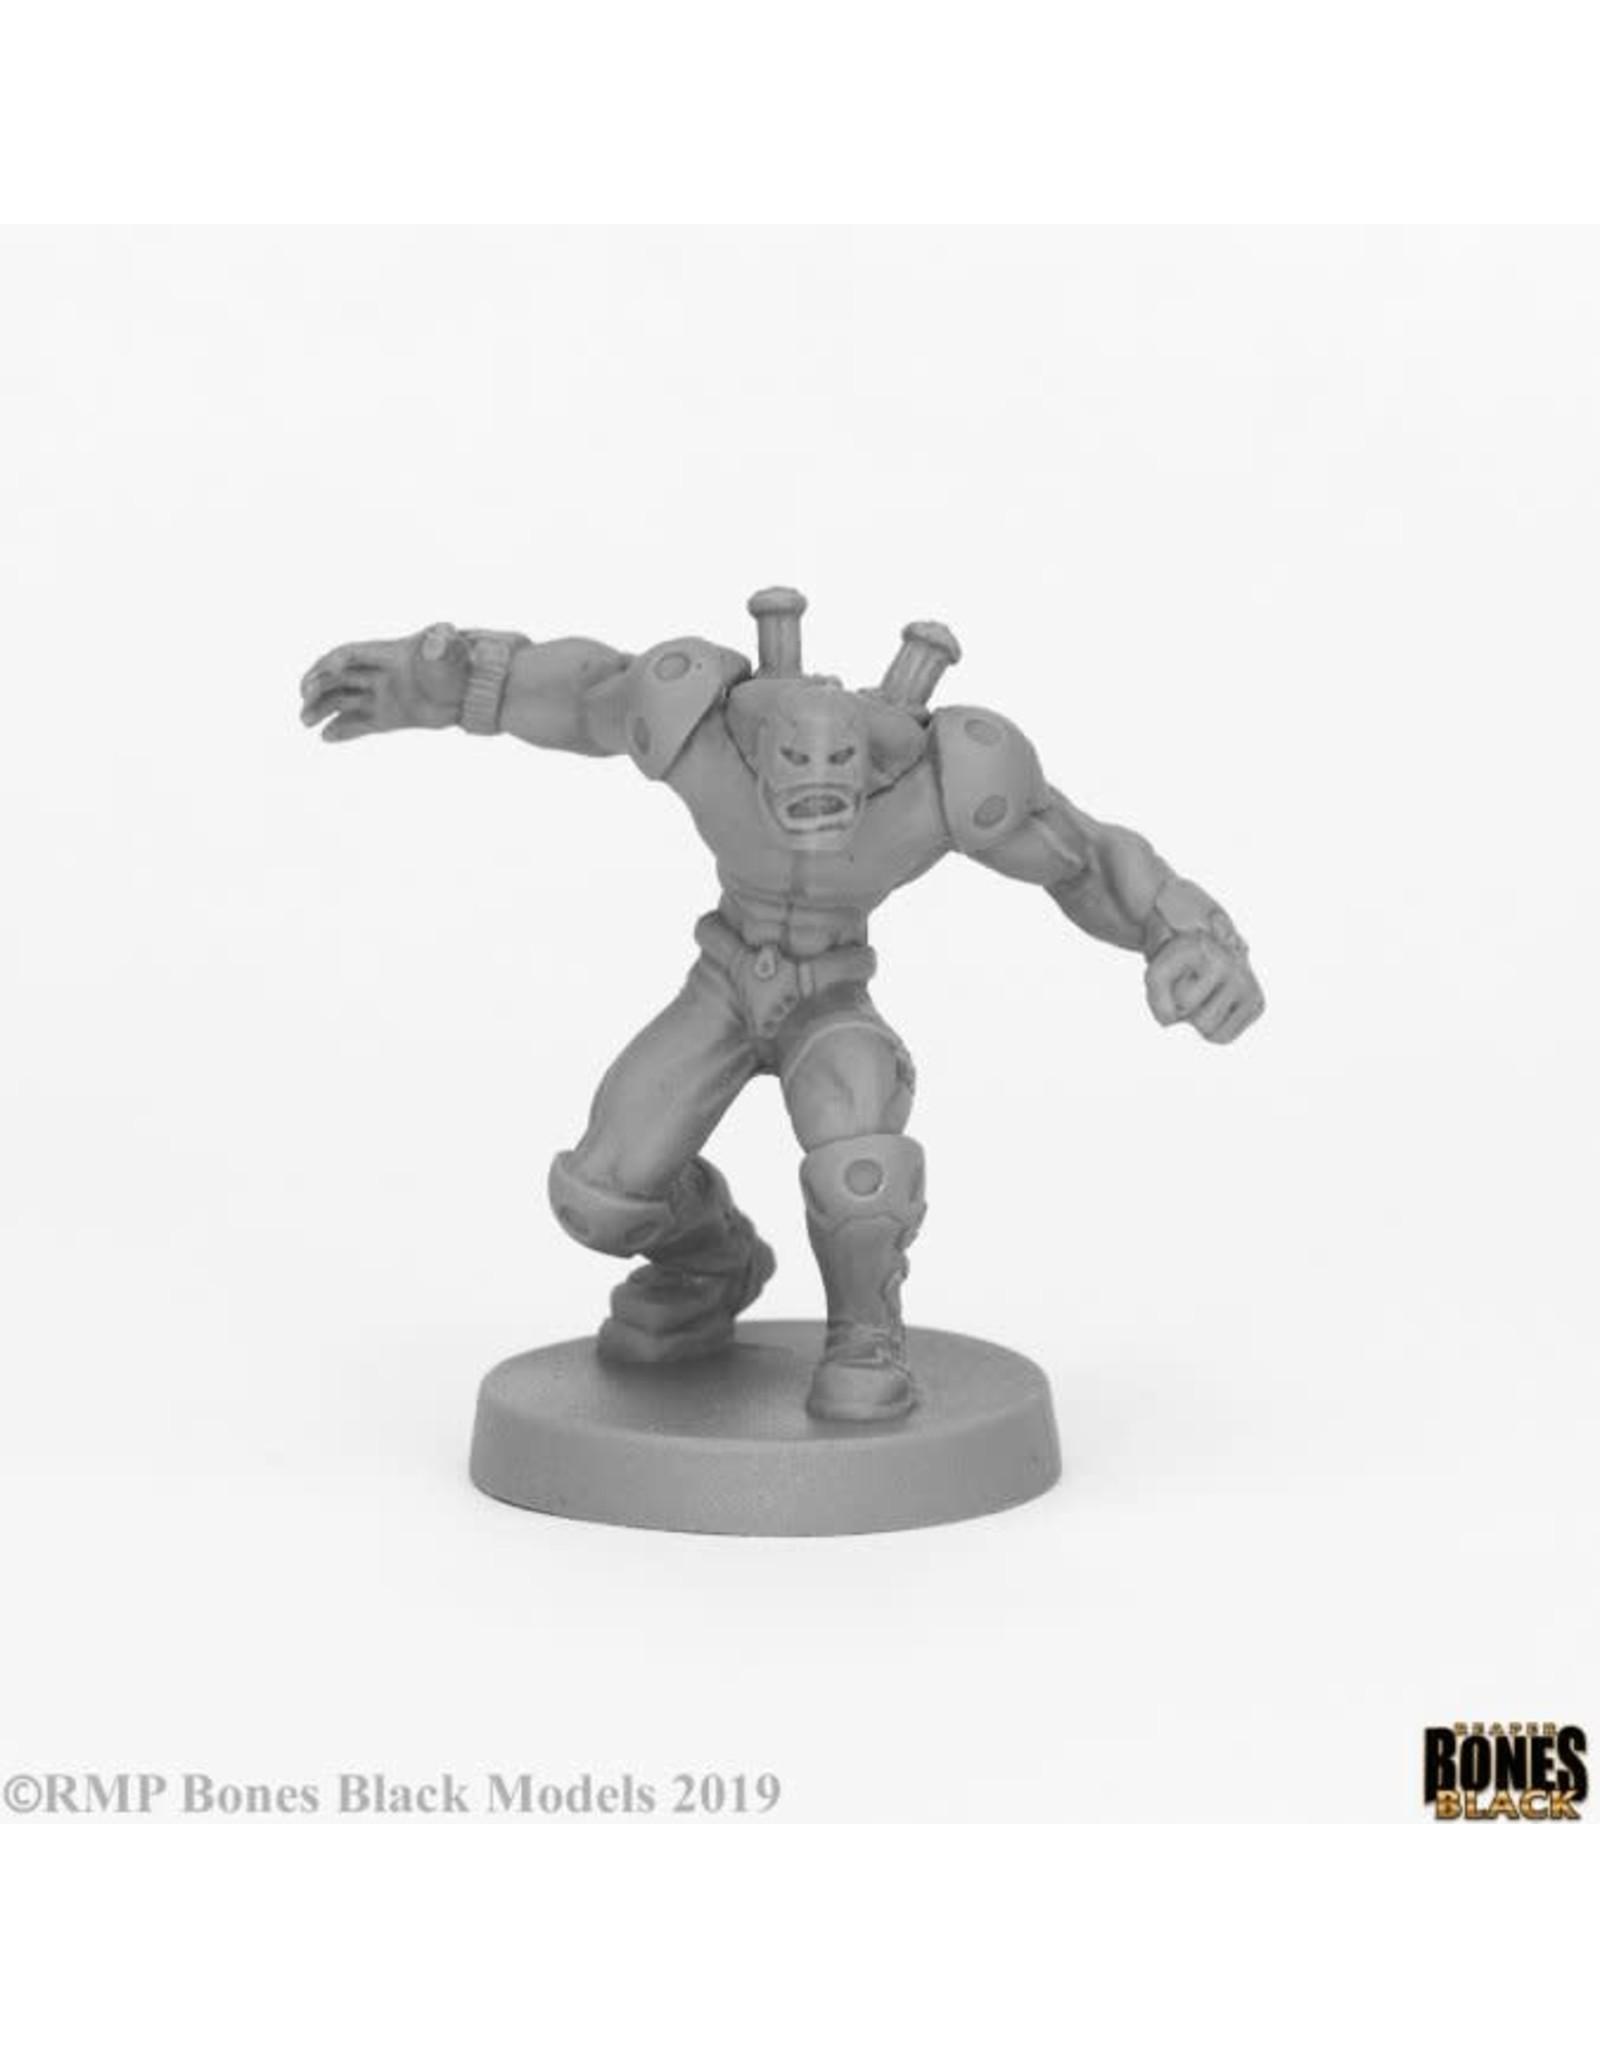 Reaper Miniatures Bones Black: Crosswire, Super Villain